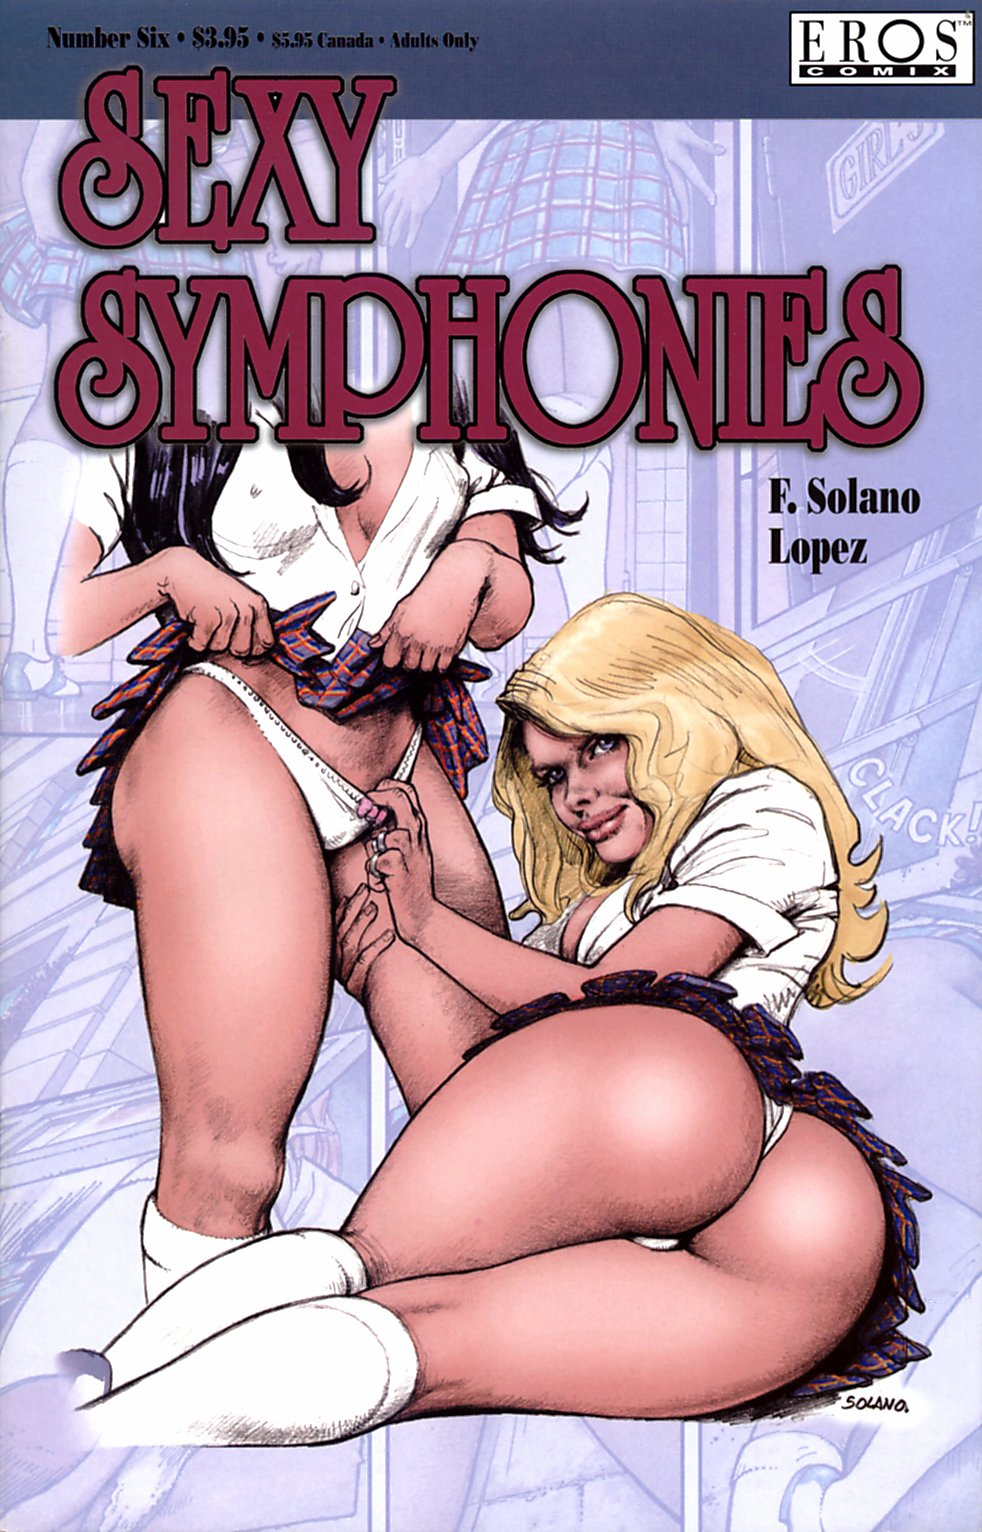 [Francisco Solano Lopez] Sexy Symphonies #6